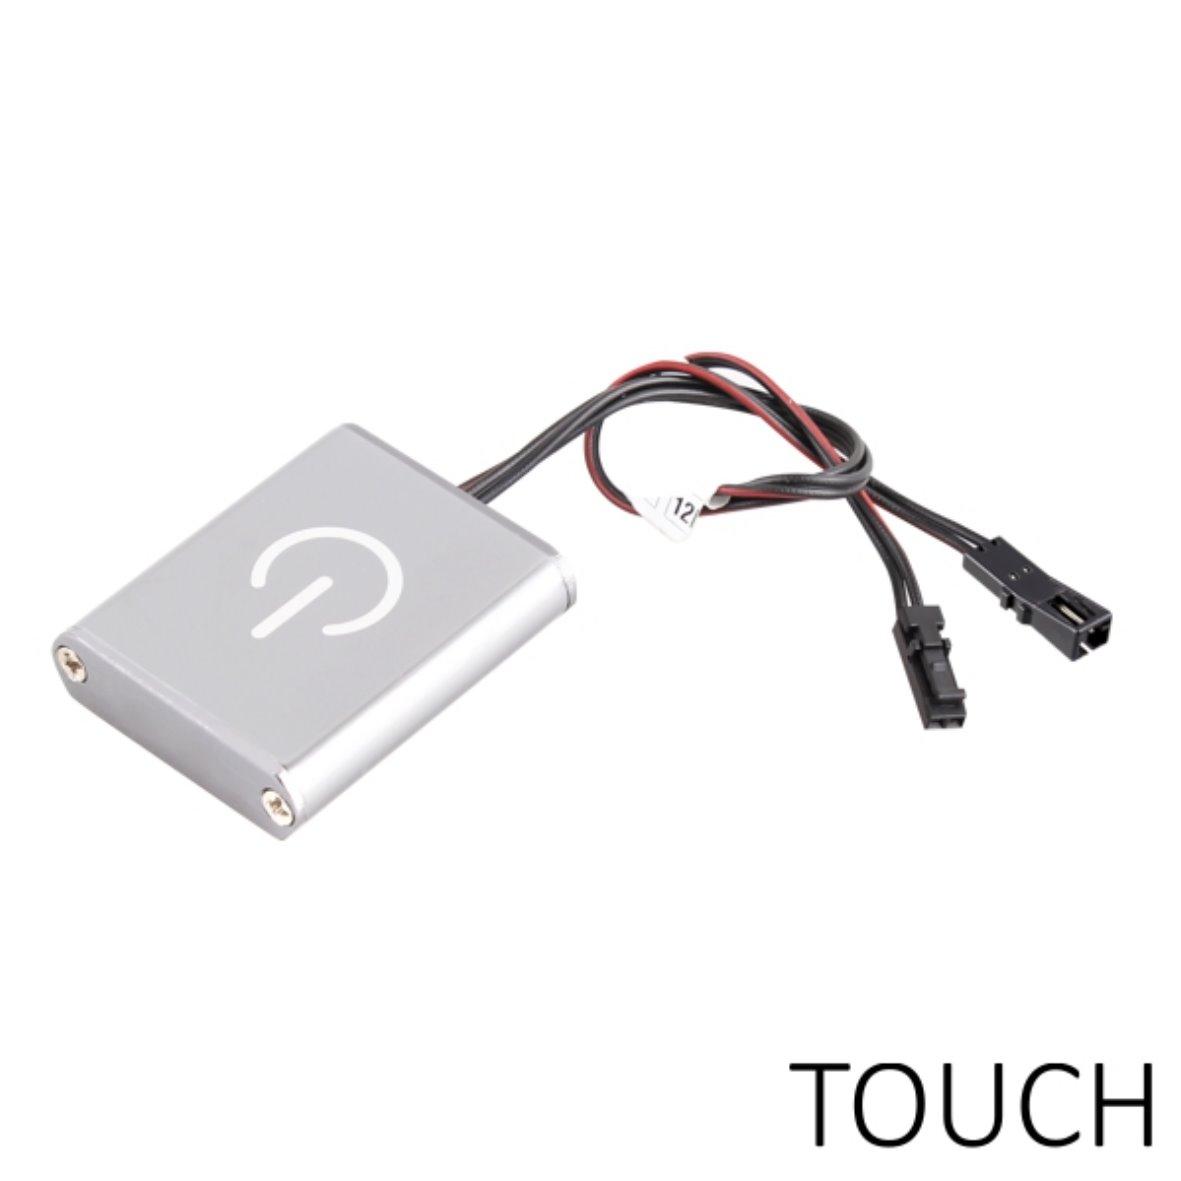 aufbau mini touch dimmer touchdimmer schalter 12v f r led lampen leuchte ebay. Black Bedroom Furniture Sets. Home Design Ideas